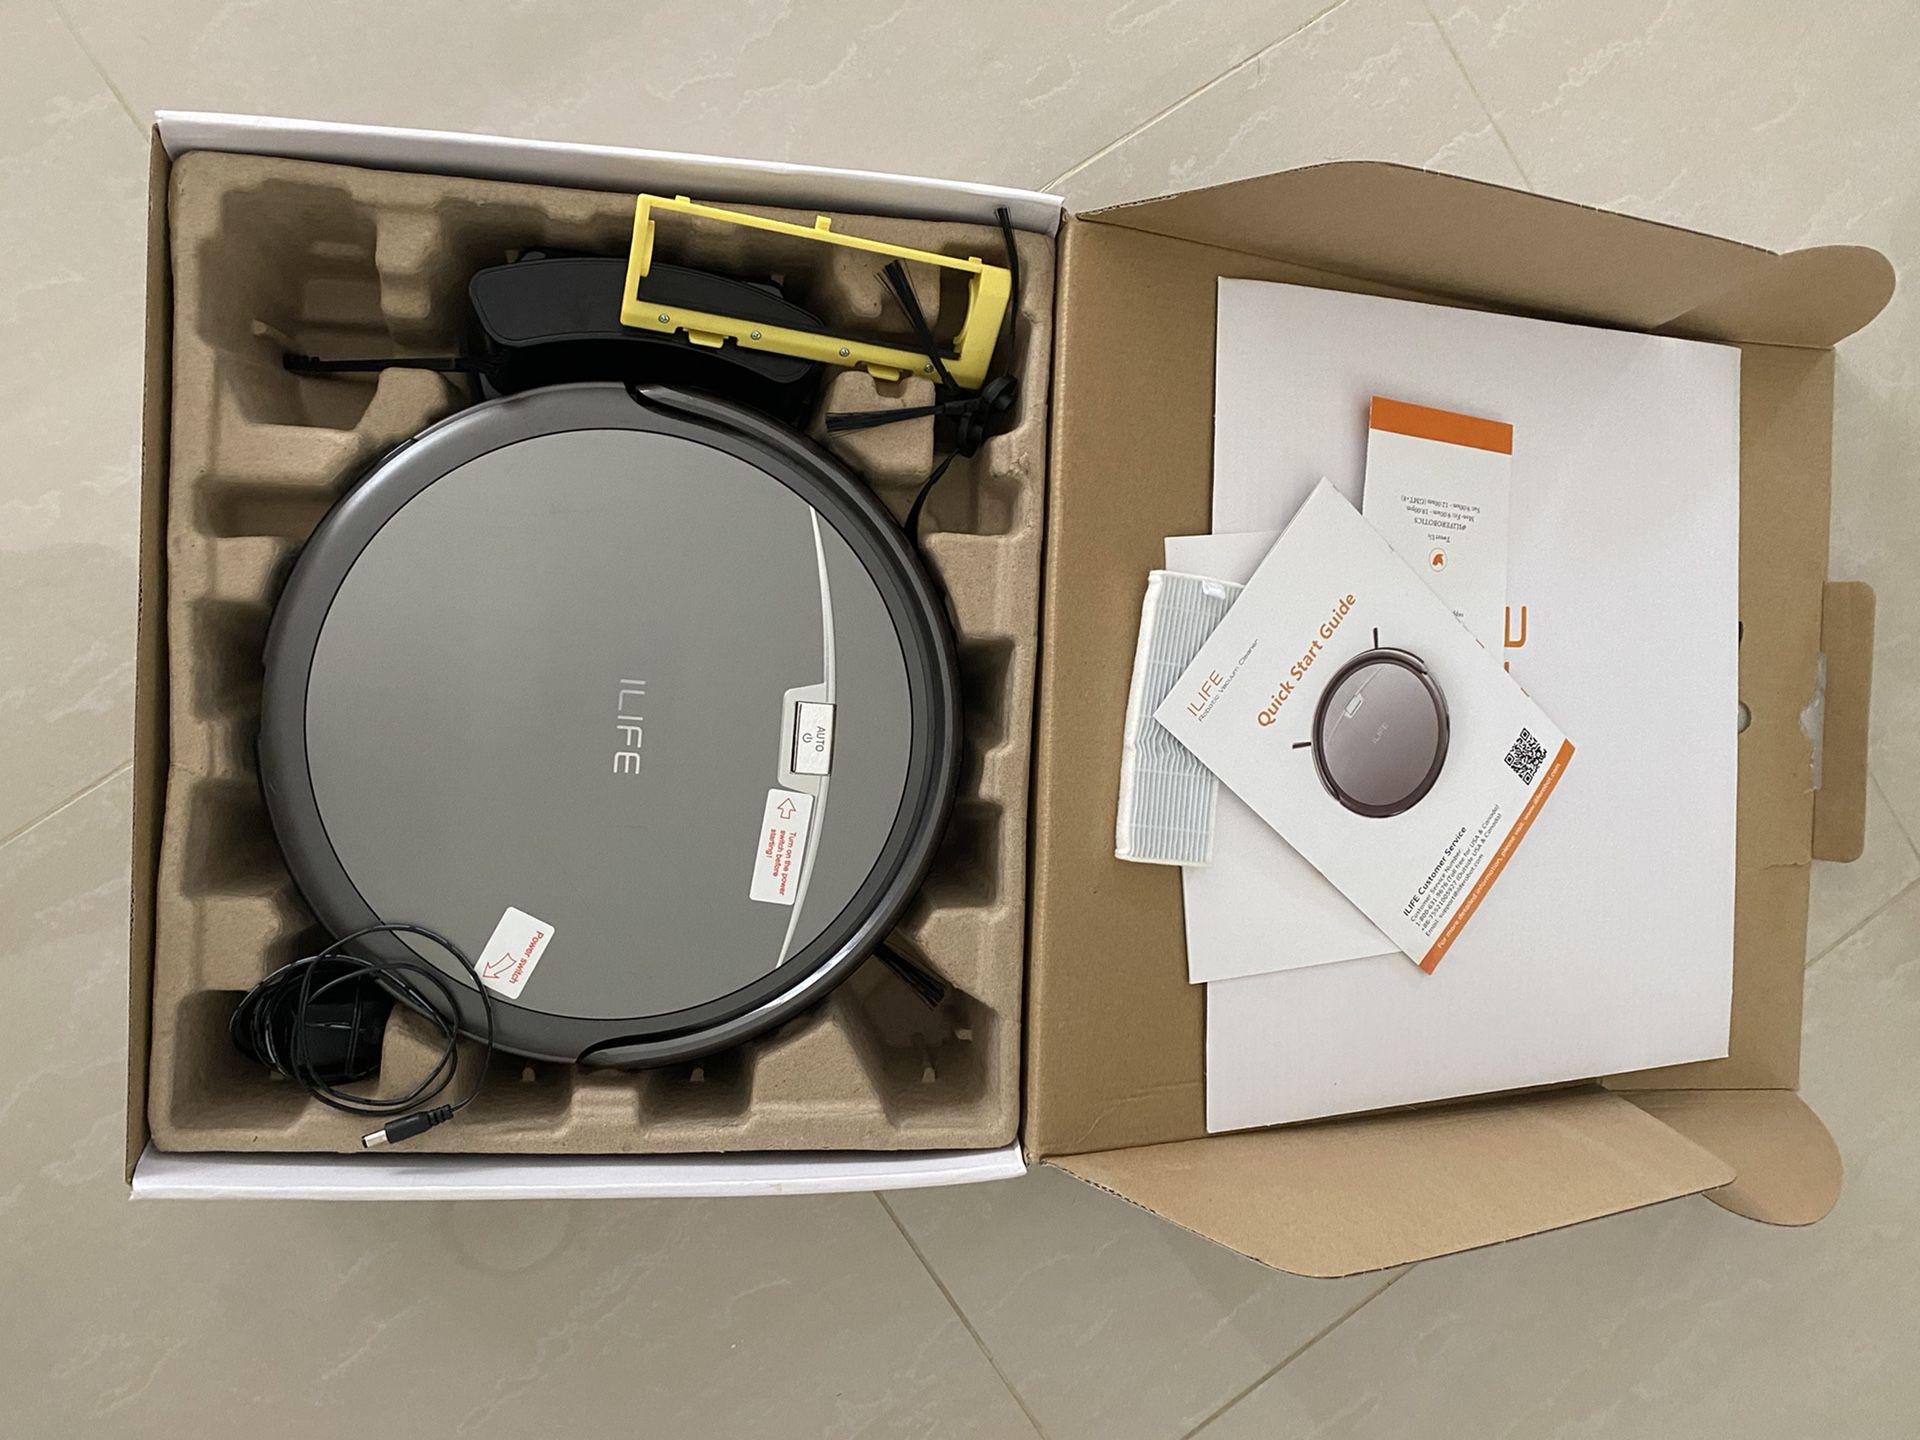 Robot Vacuum Cleaner ( Roomba )